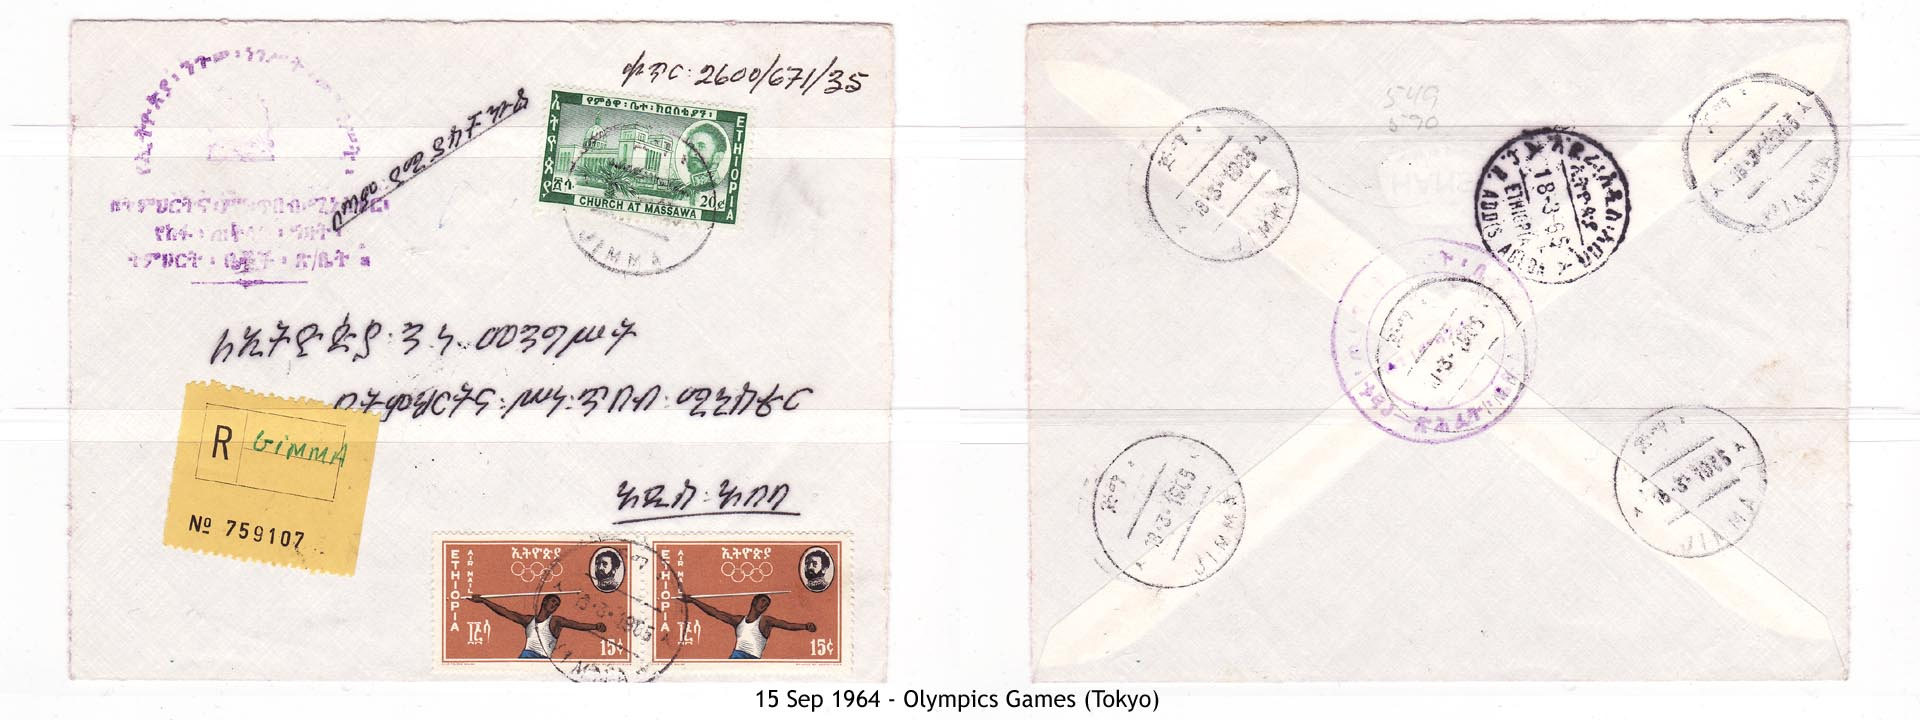 19640915 – Olympics Games (Tokyo)